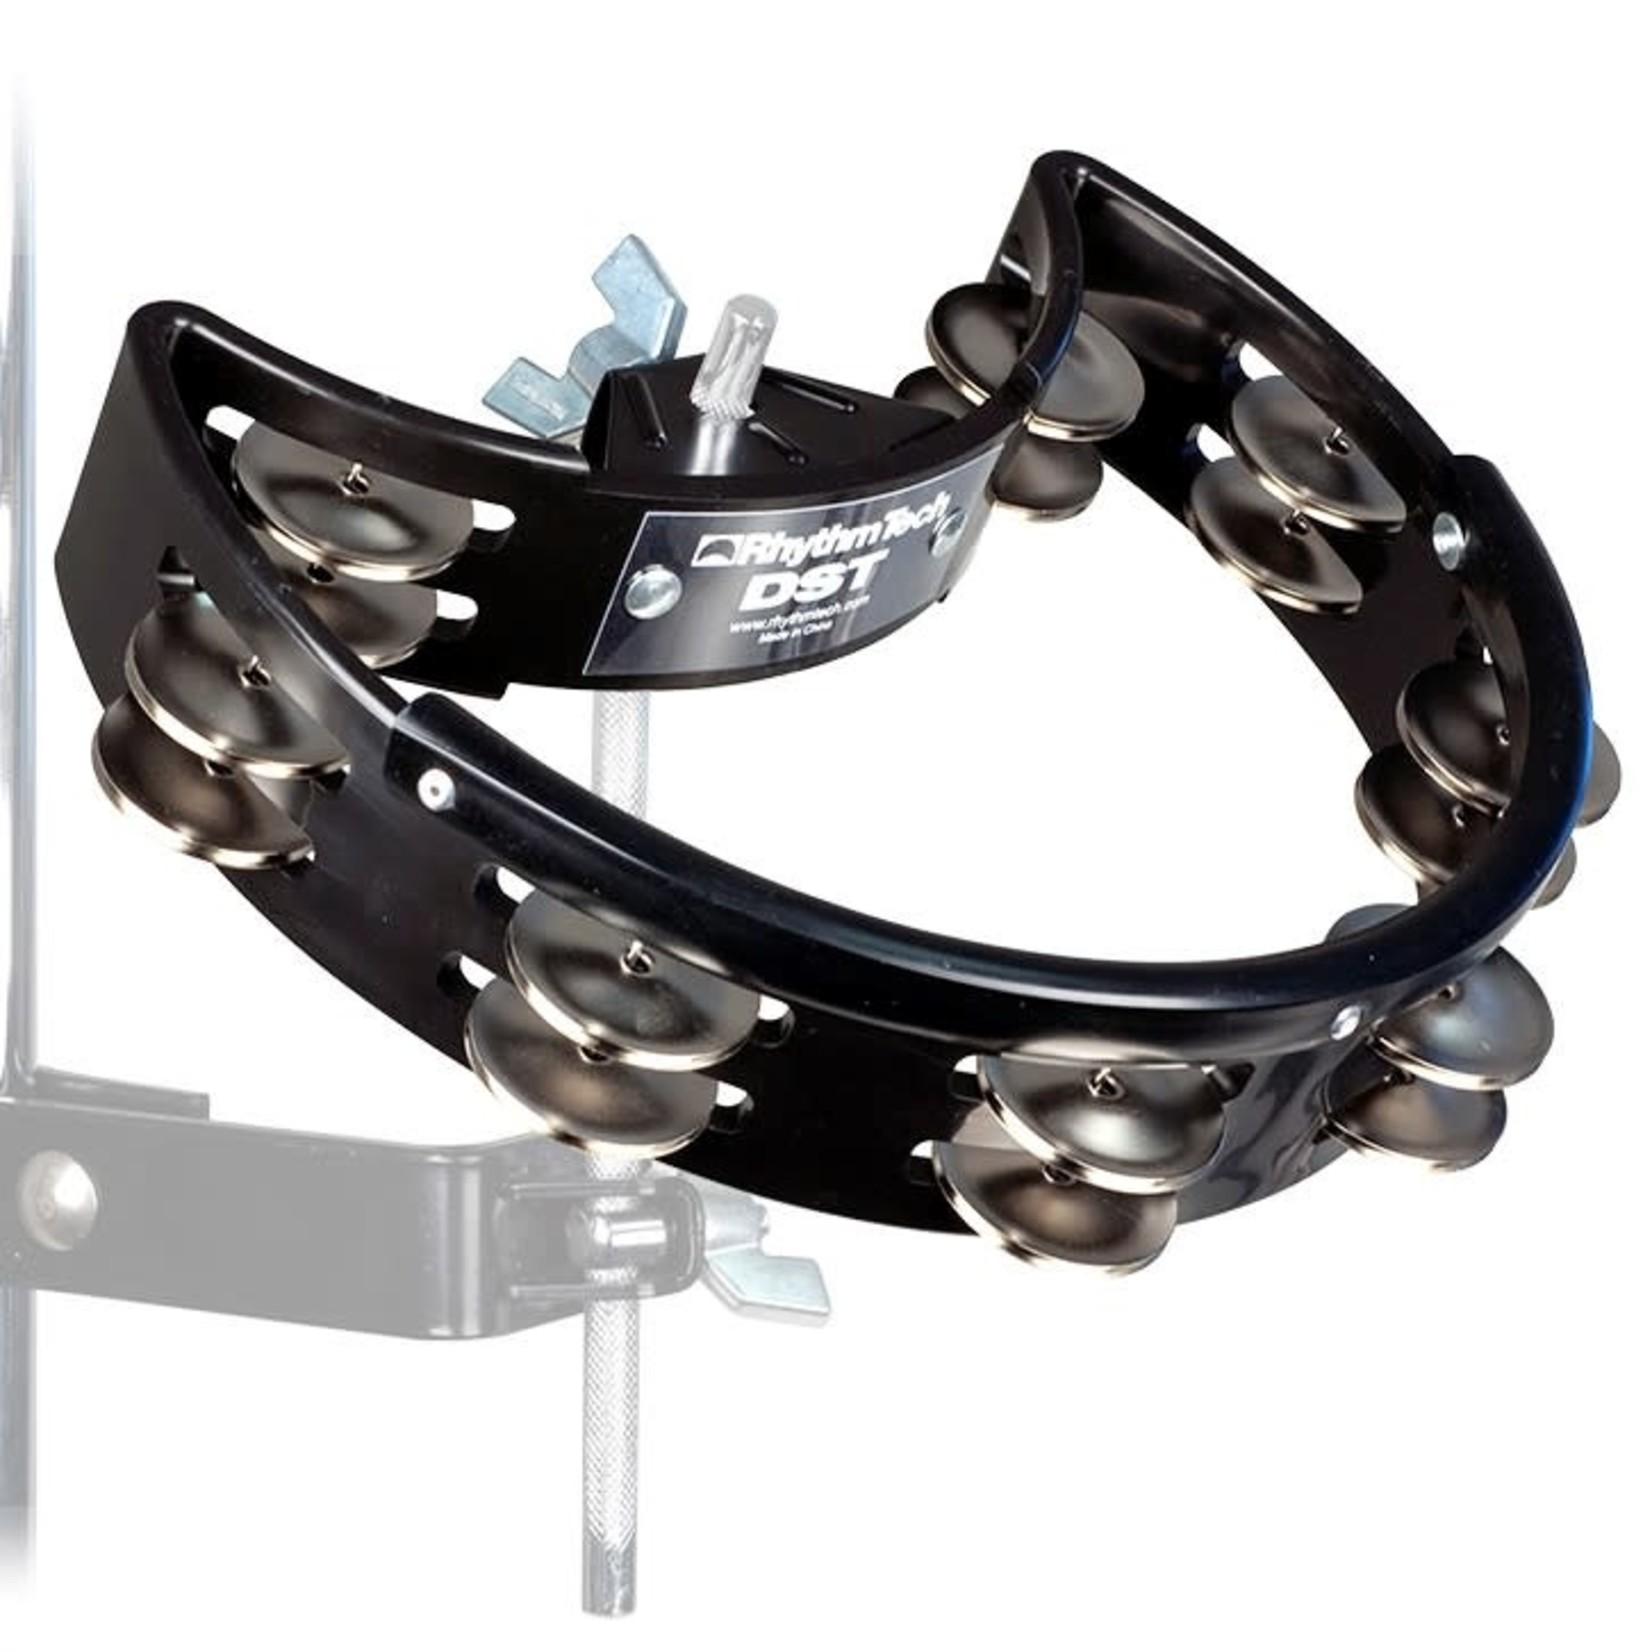 Rhythm Tech RHYTHM TECH DRUM SET TAMBOURINE NICKEL (BLACK)  DST10-U